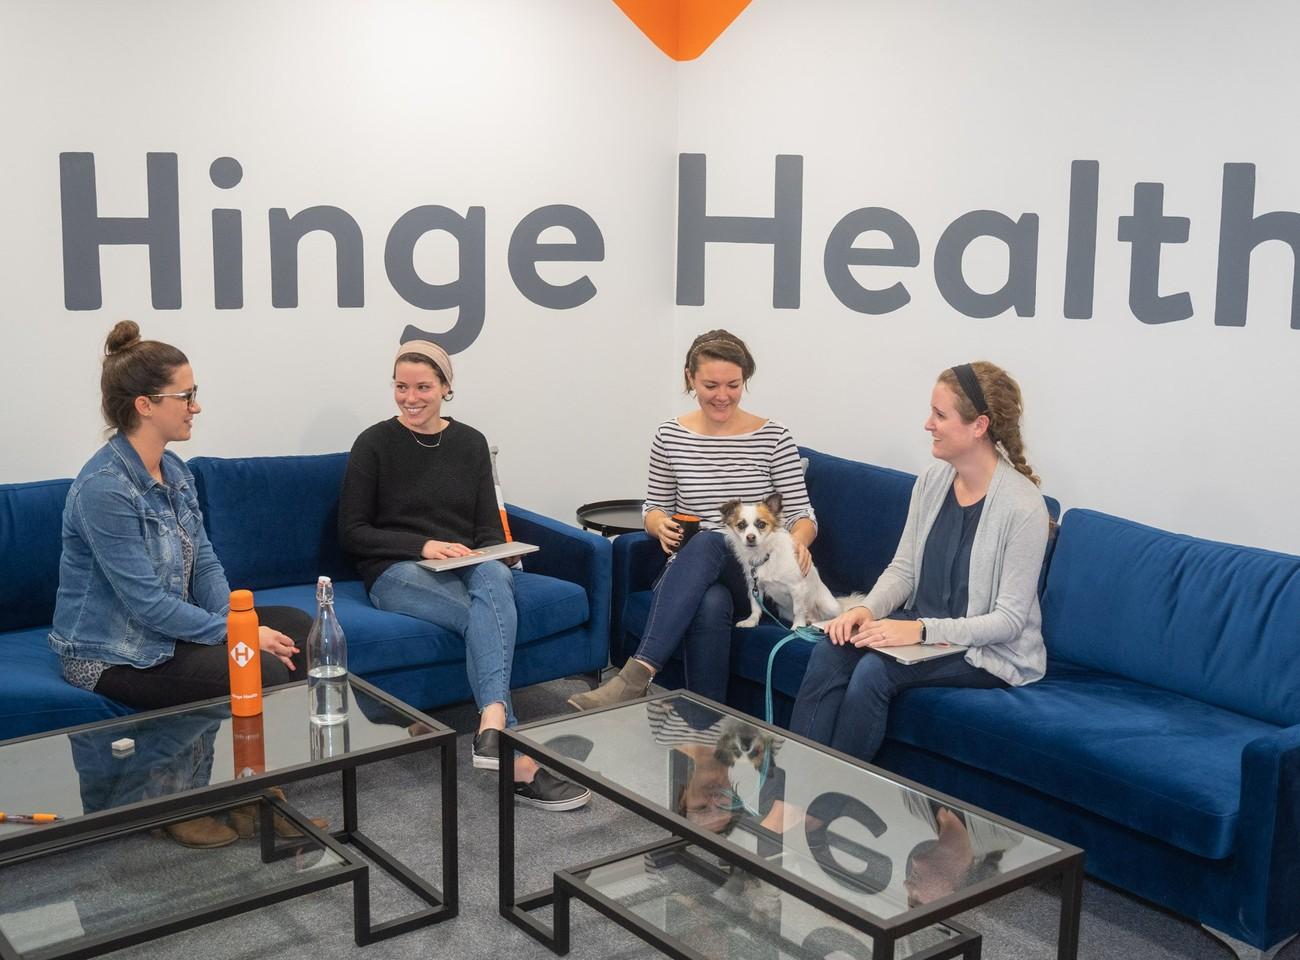 Hinge Health Careers